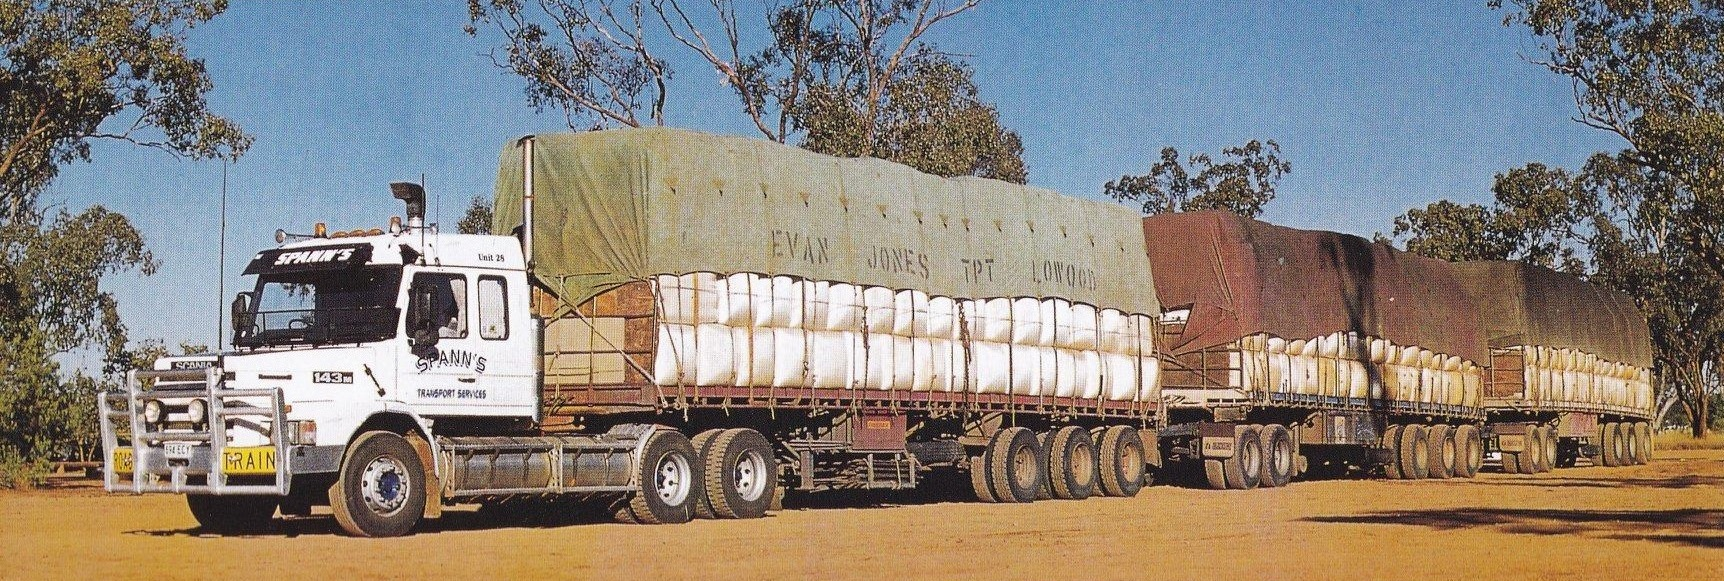 Kings-Forman-Archieve--Scania-450-HP--triple-trailer--Toowoomba-2